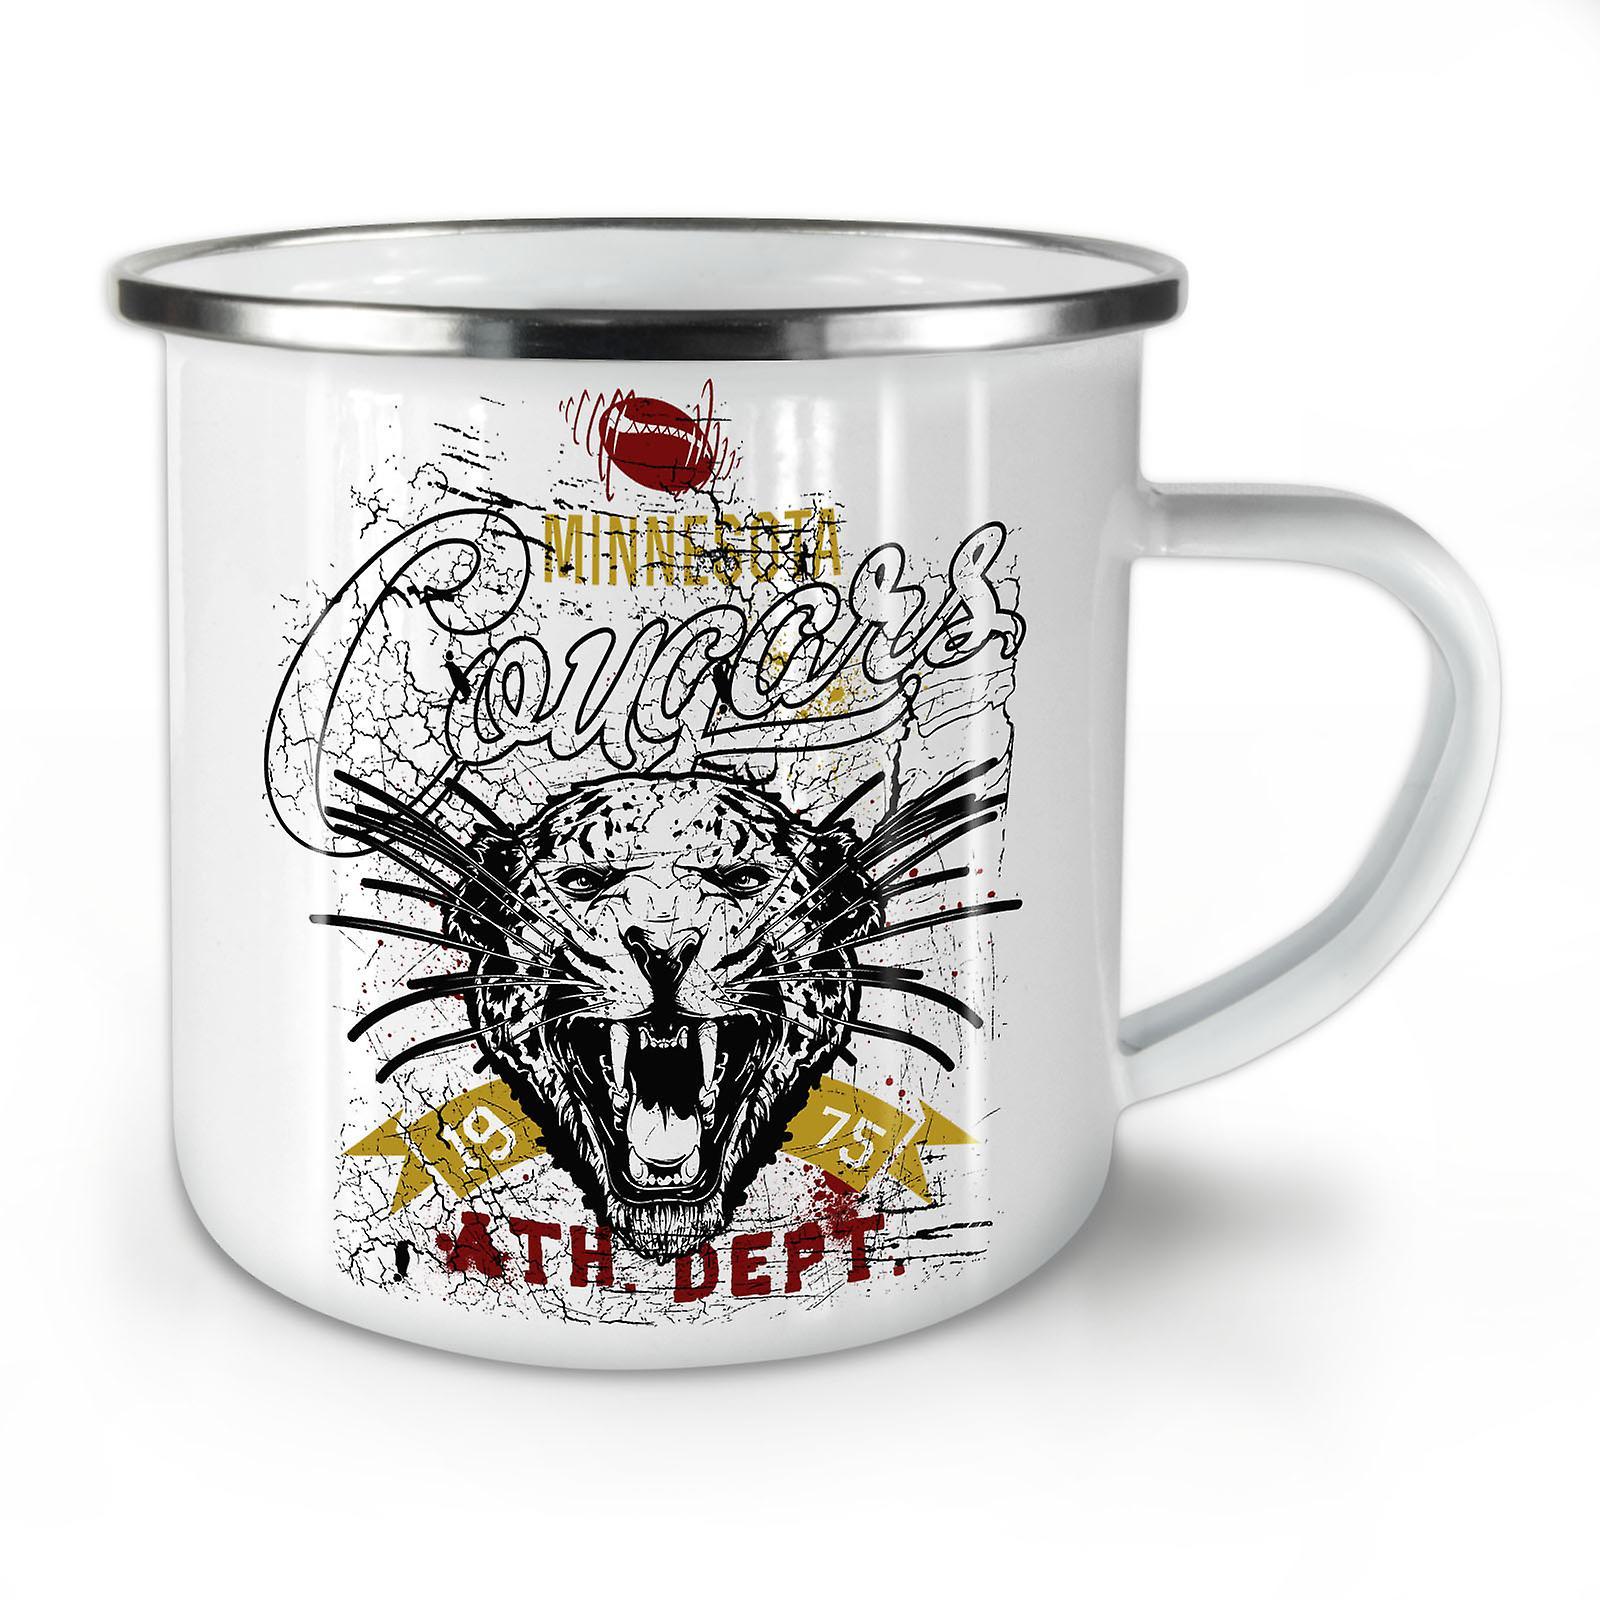 Whitetea Émail Café Nouveau OzWellcoda Tiger Mug10 Couguars Head rtCxhdsQ